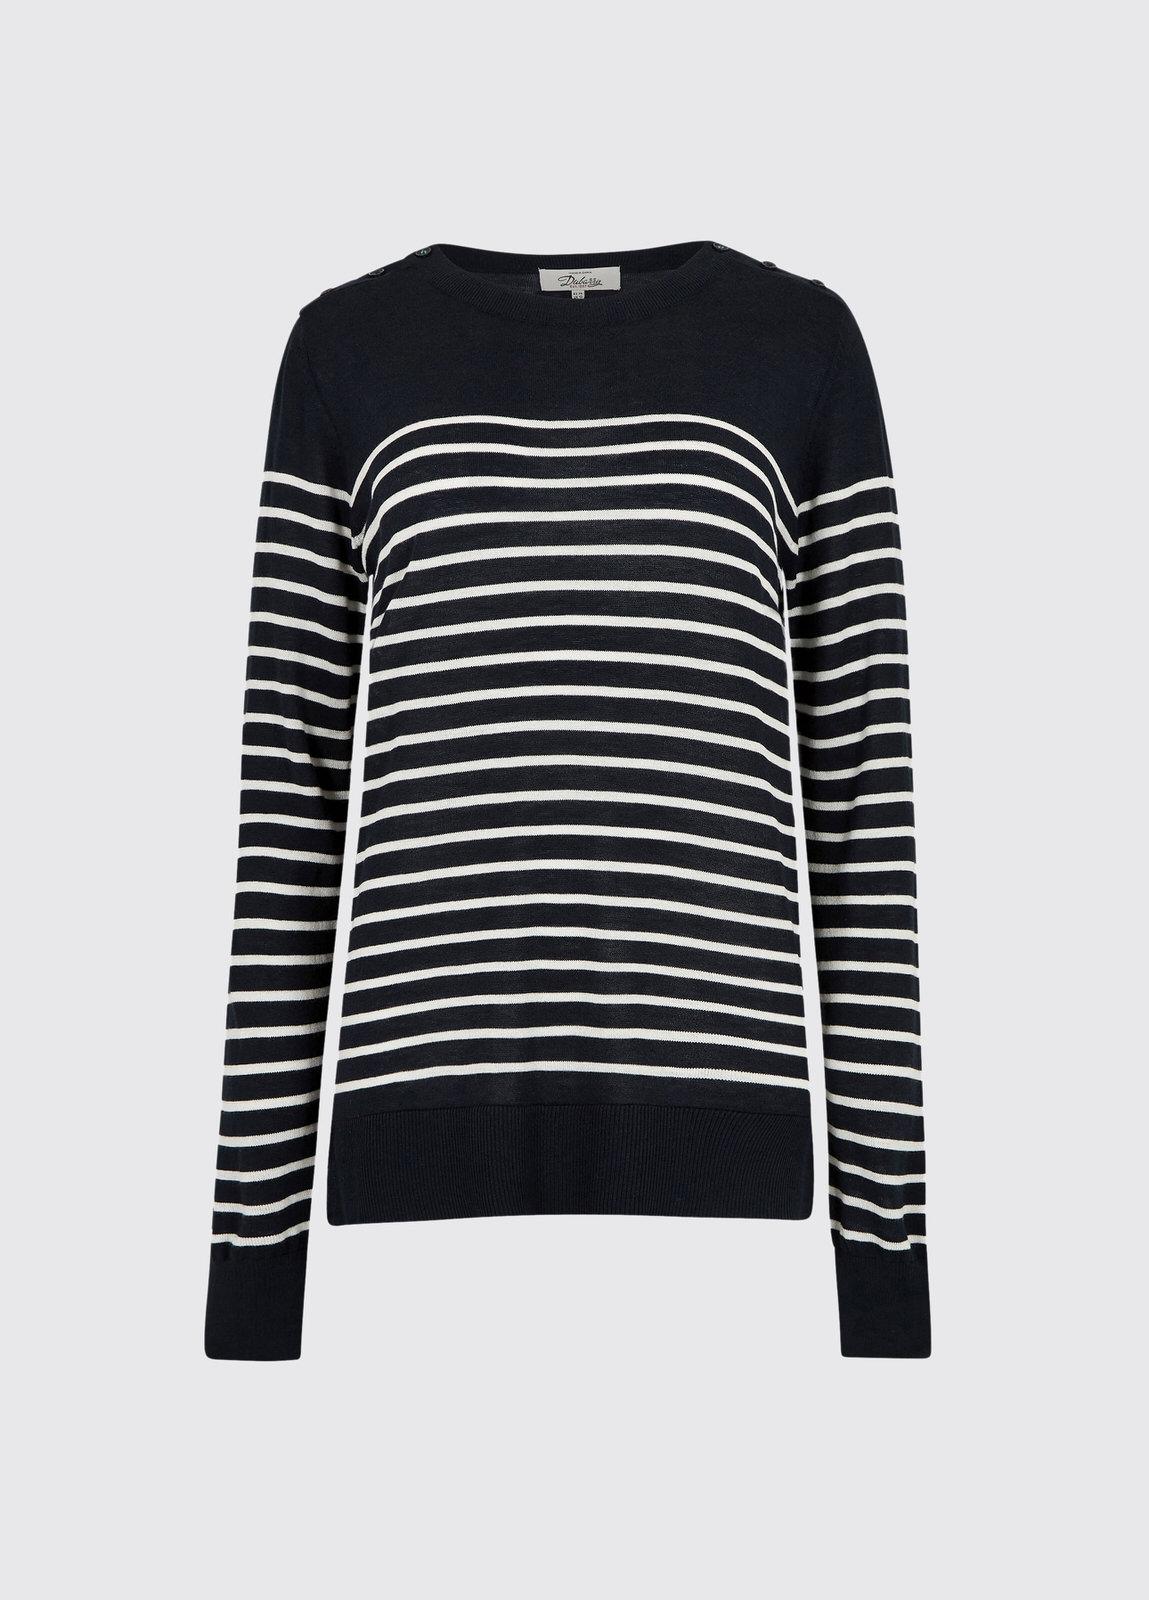 Portlaw lightweight Sweater - Navy